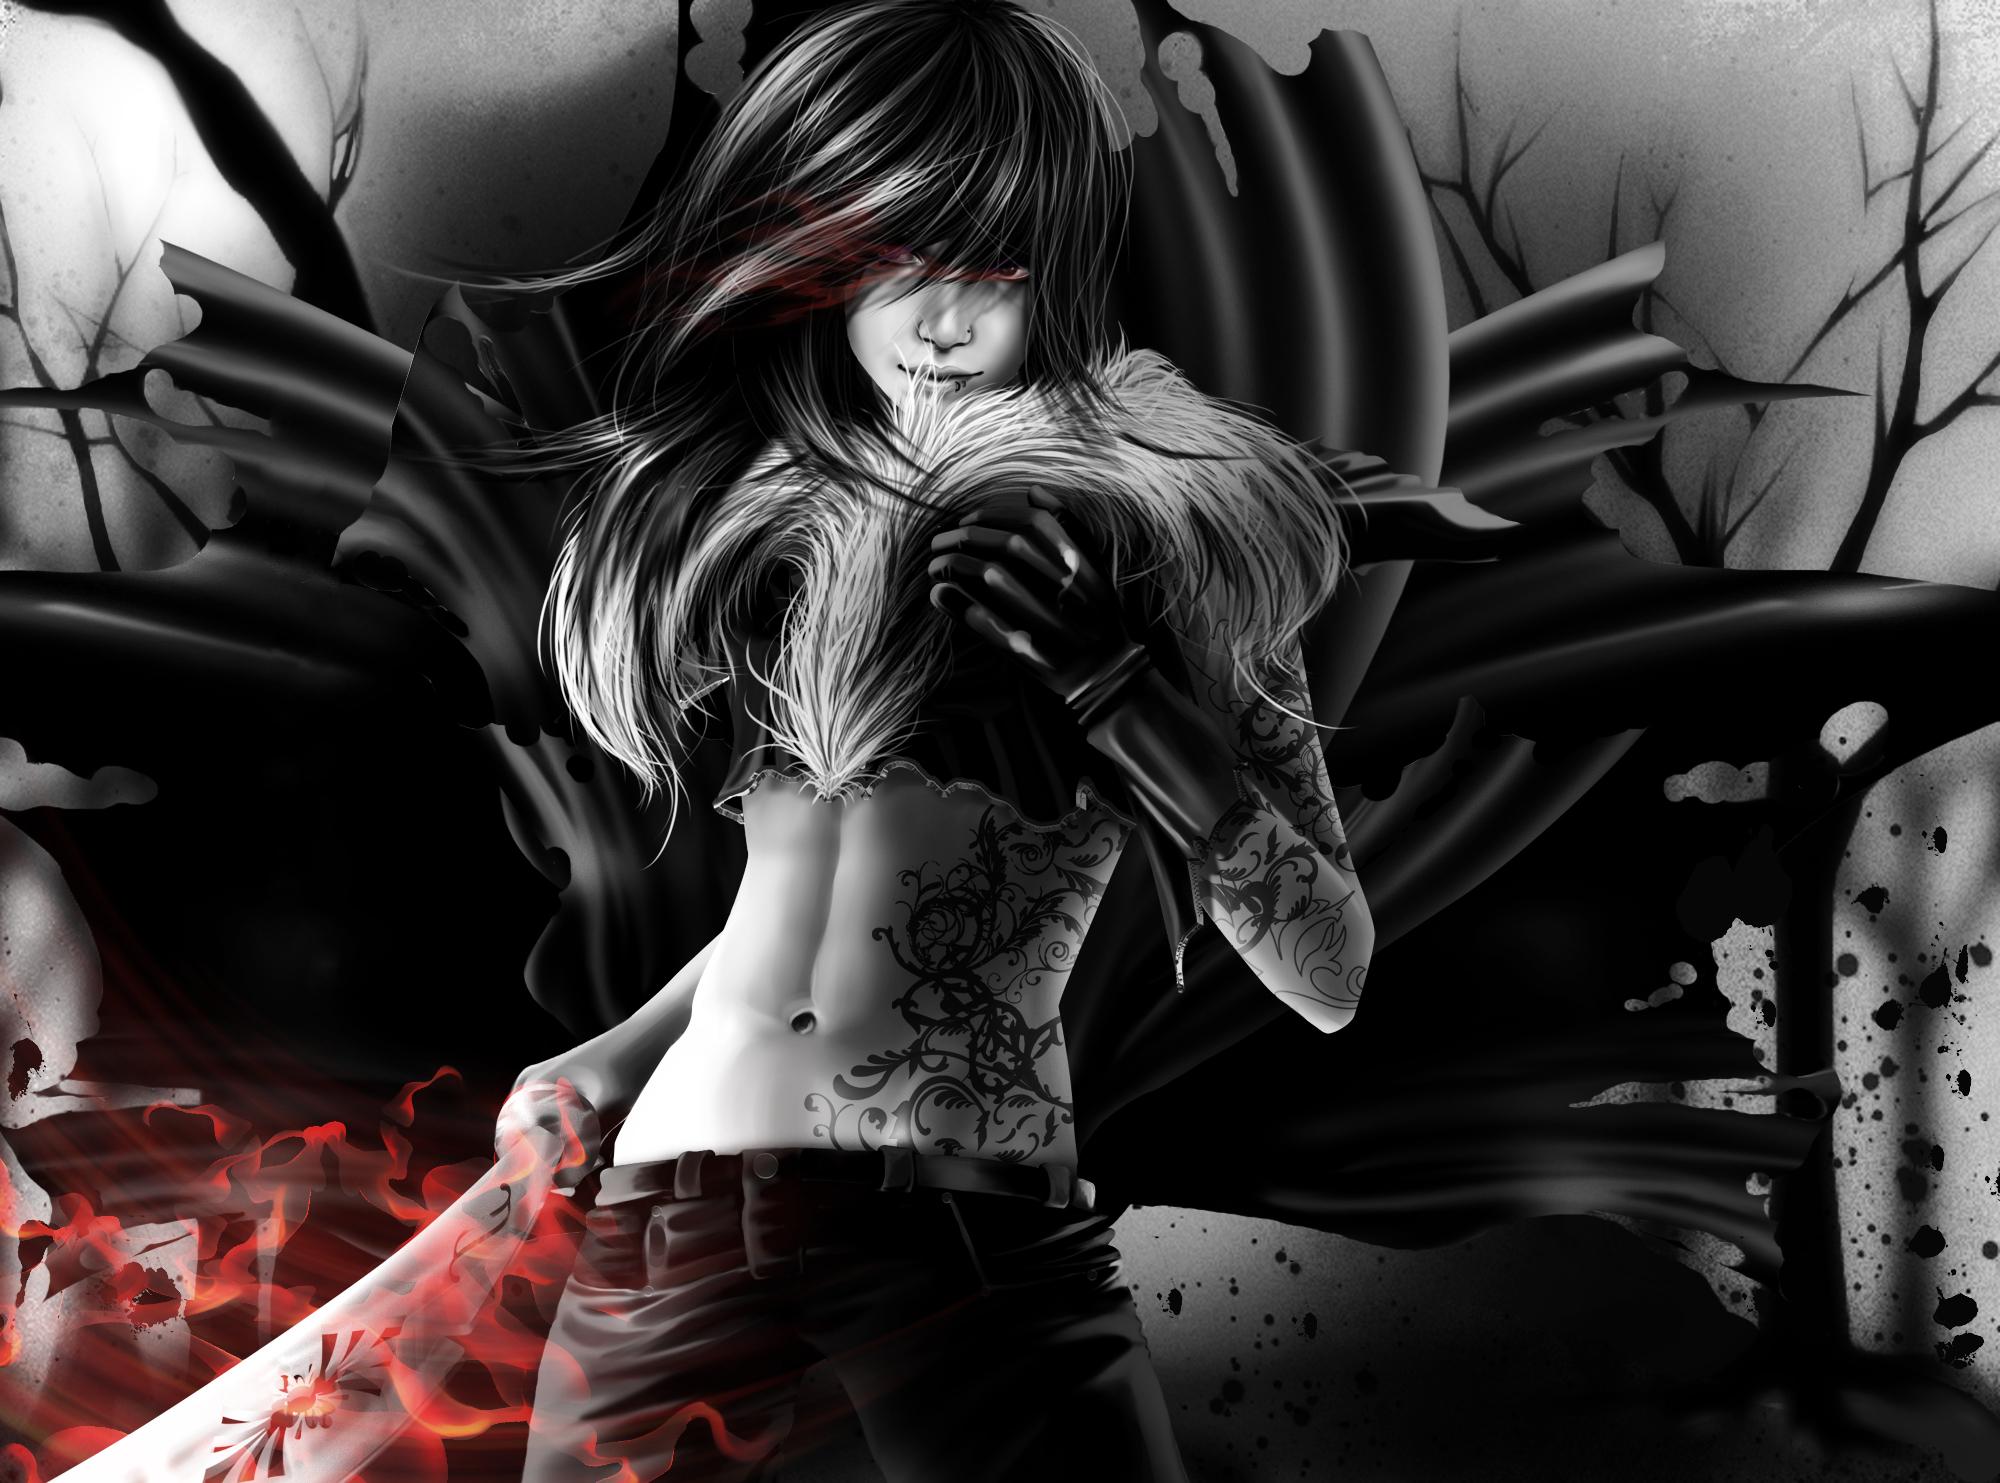 Art vampire vampire girl sword black and white tattoo ...